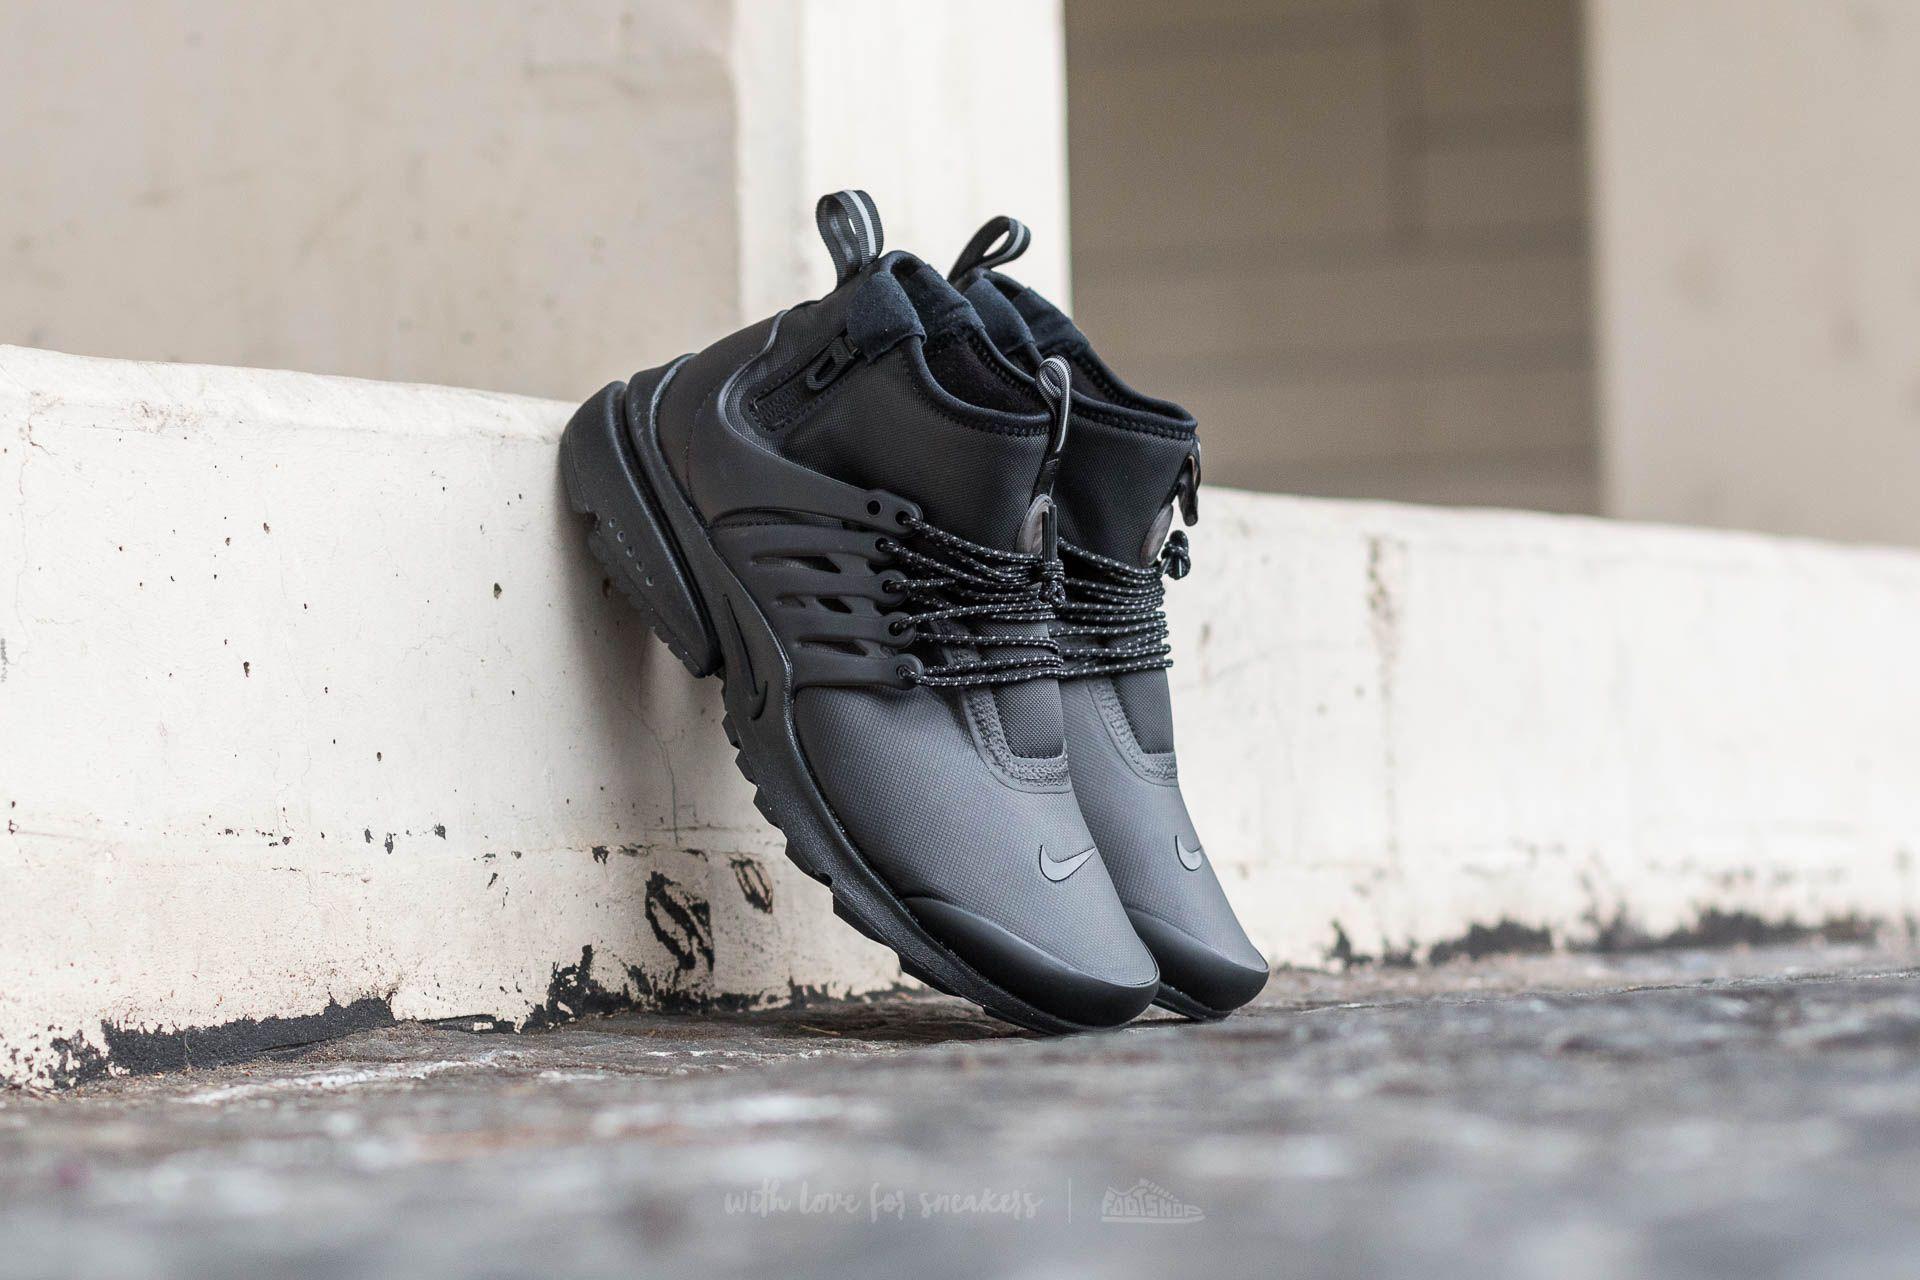 5e4446d687a9 Nike Air Presto MID Utility Black  Black-Volt-Dark Grey